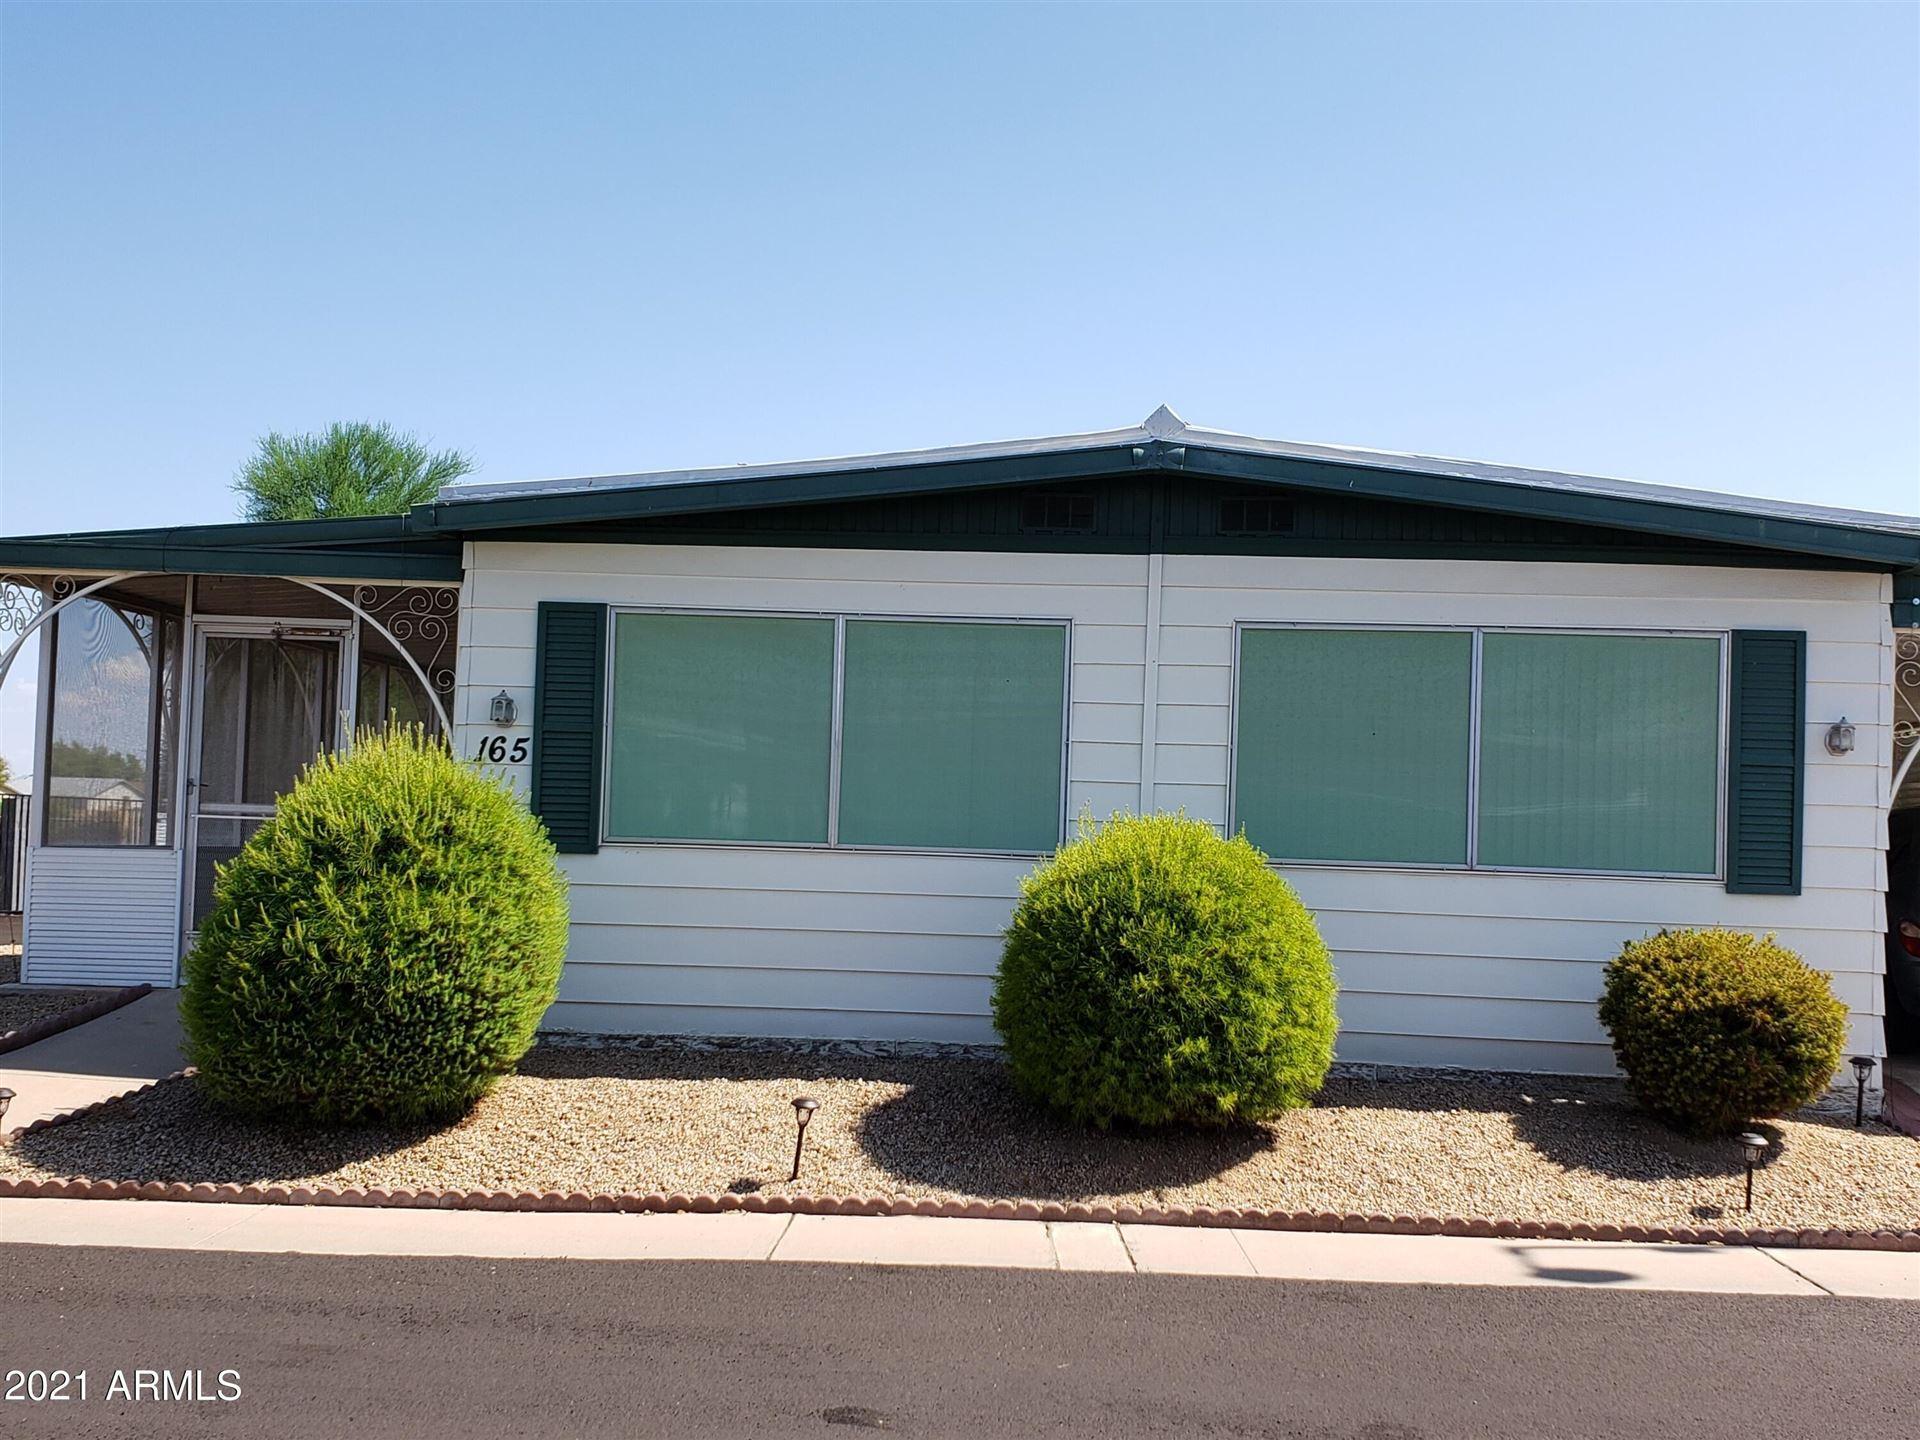 10201 N 99TH Avenue #165, Peoria, AZ 85345 - MLS#: 6266665